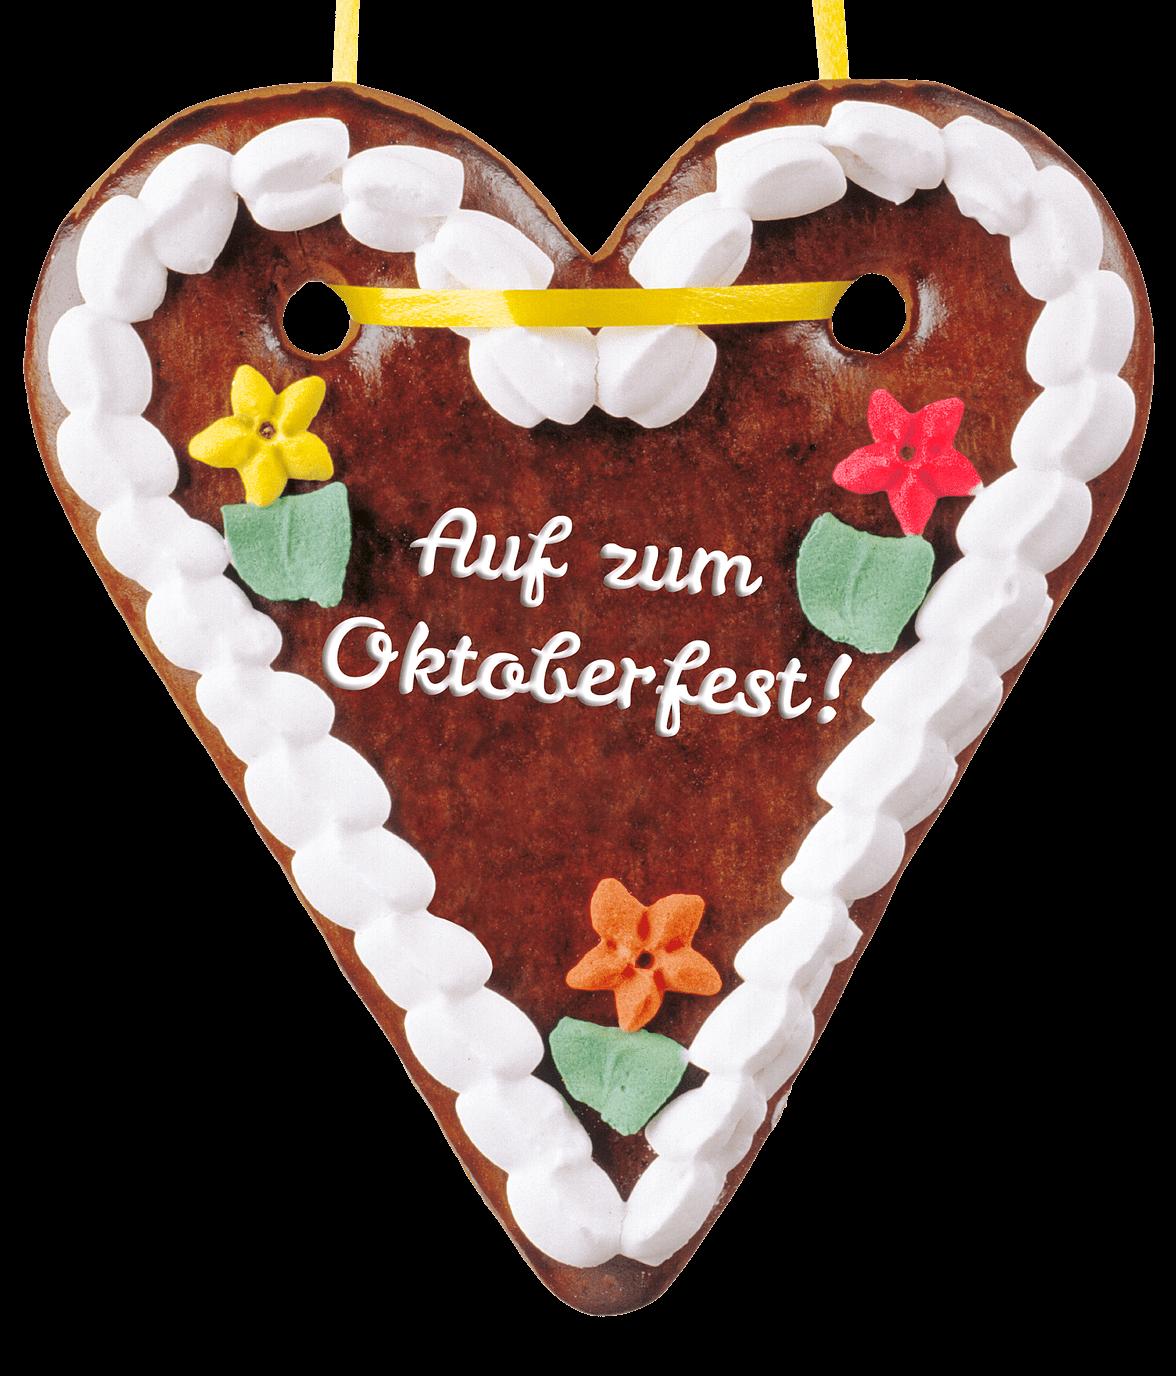 gingerbread-heart-401934_1920